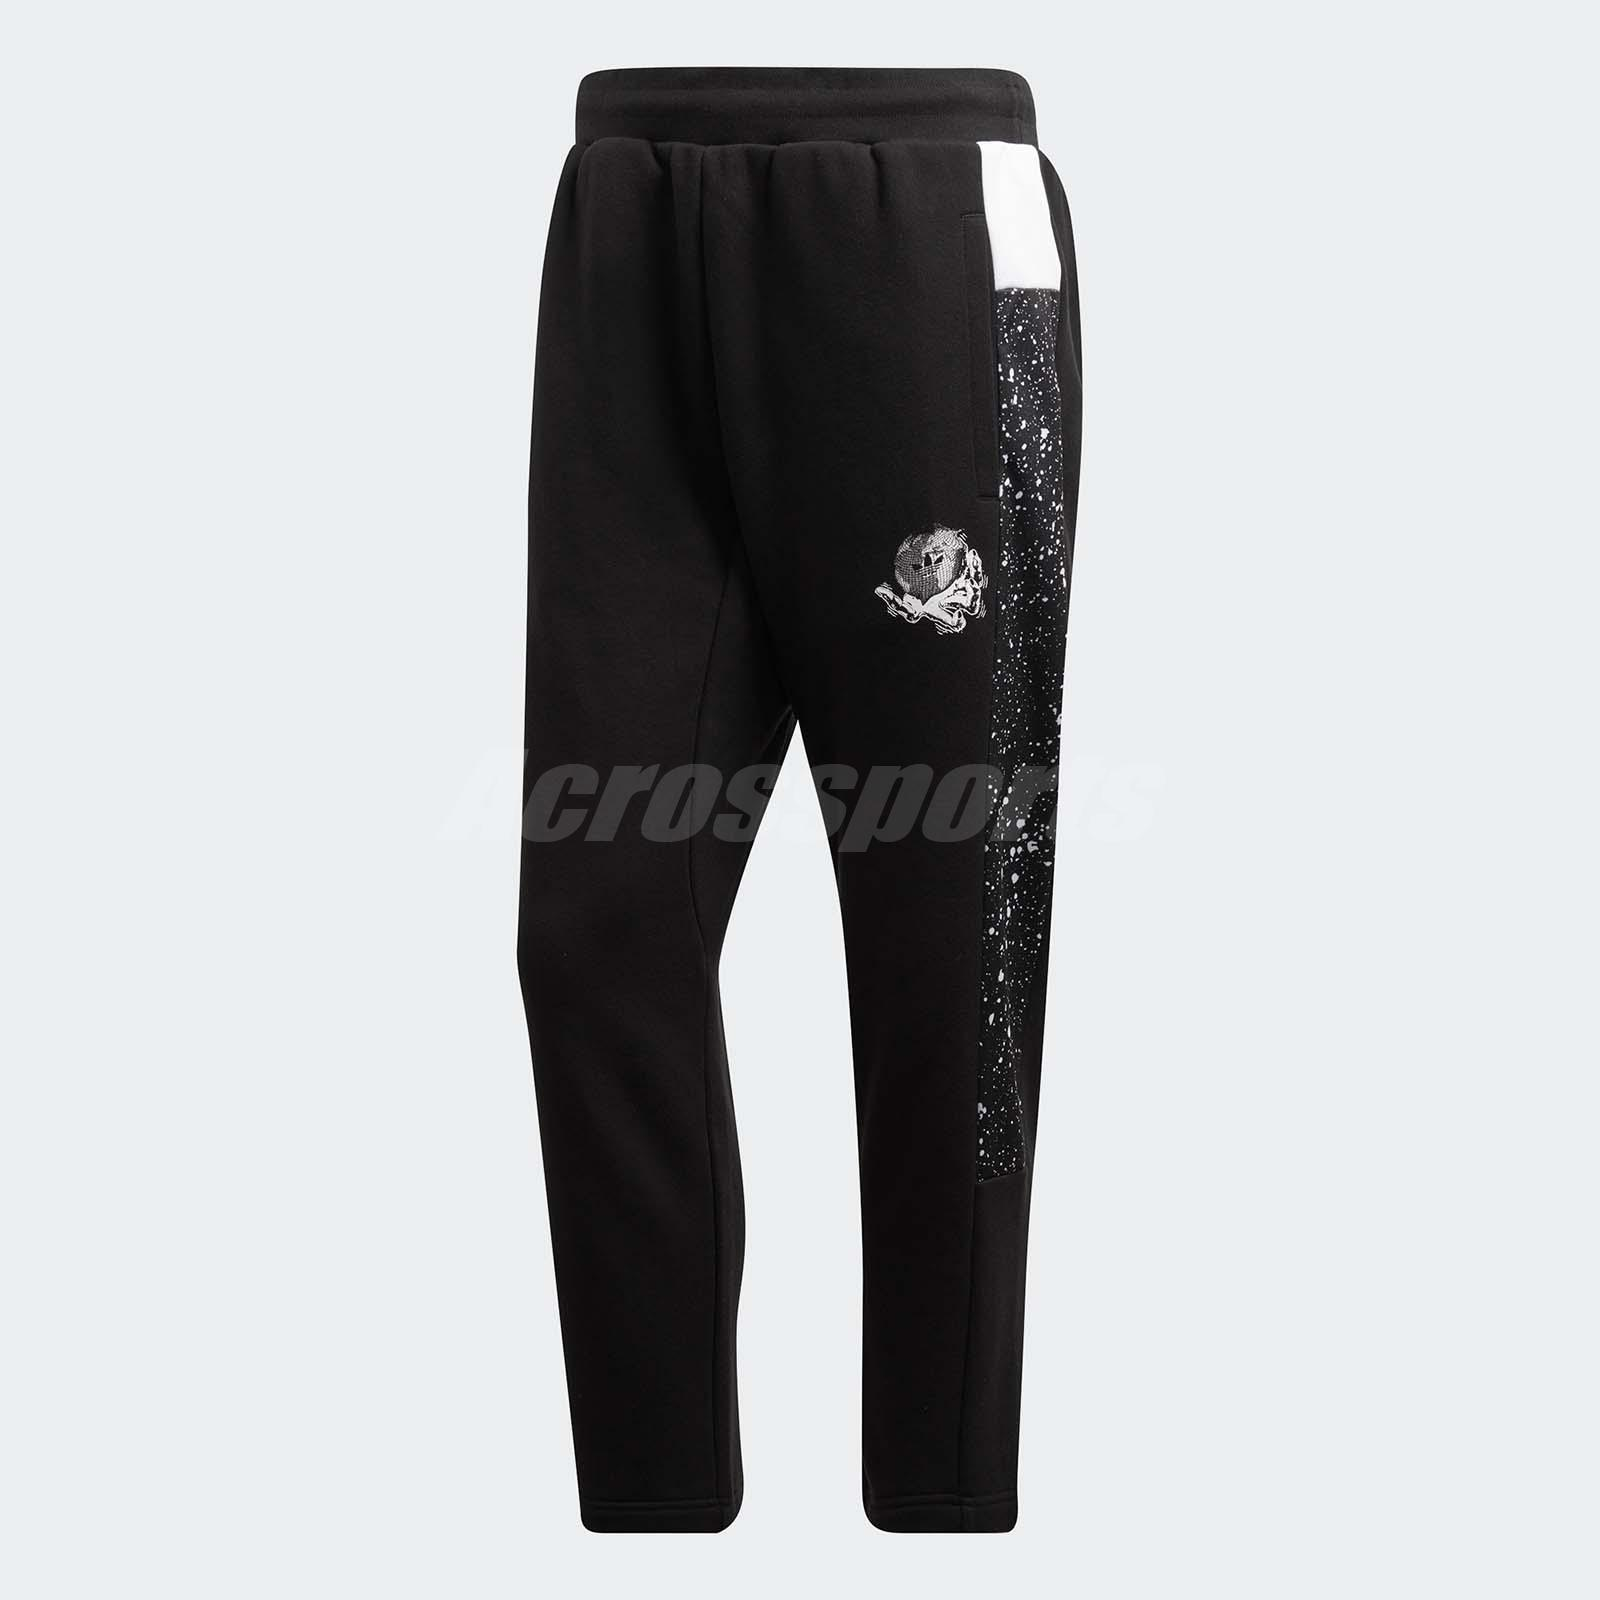 adidas Men Originals Planetoid Sweat Pants Taper Cropped Sports Gym Black DX6012